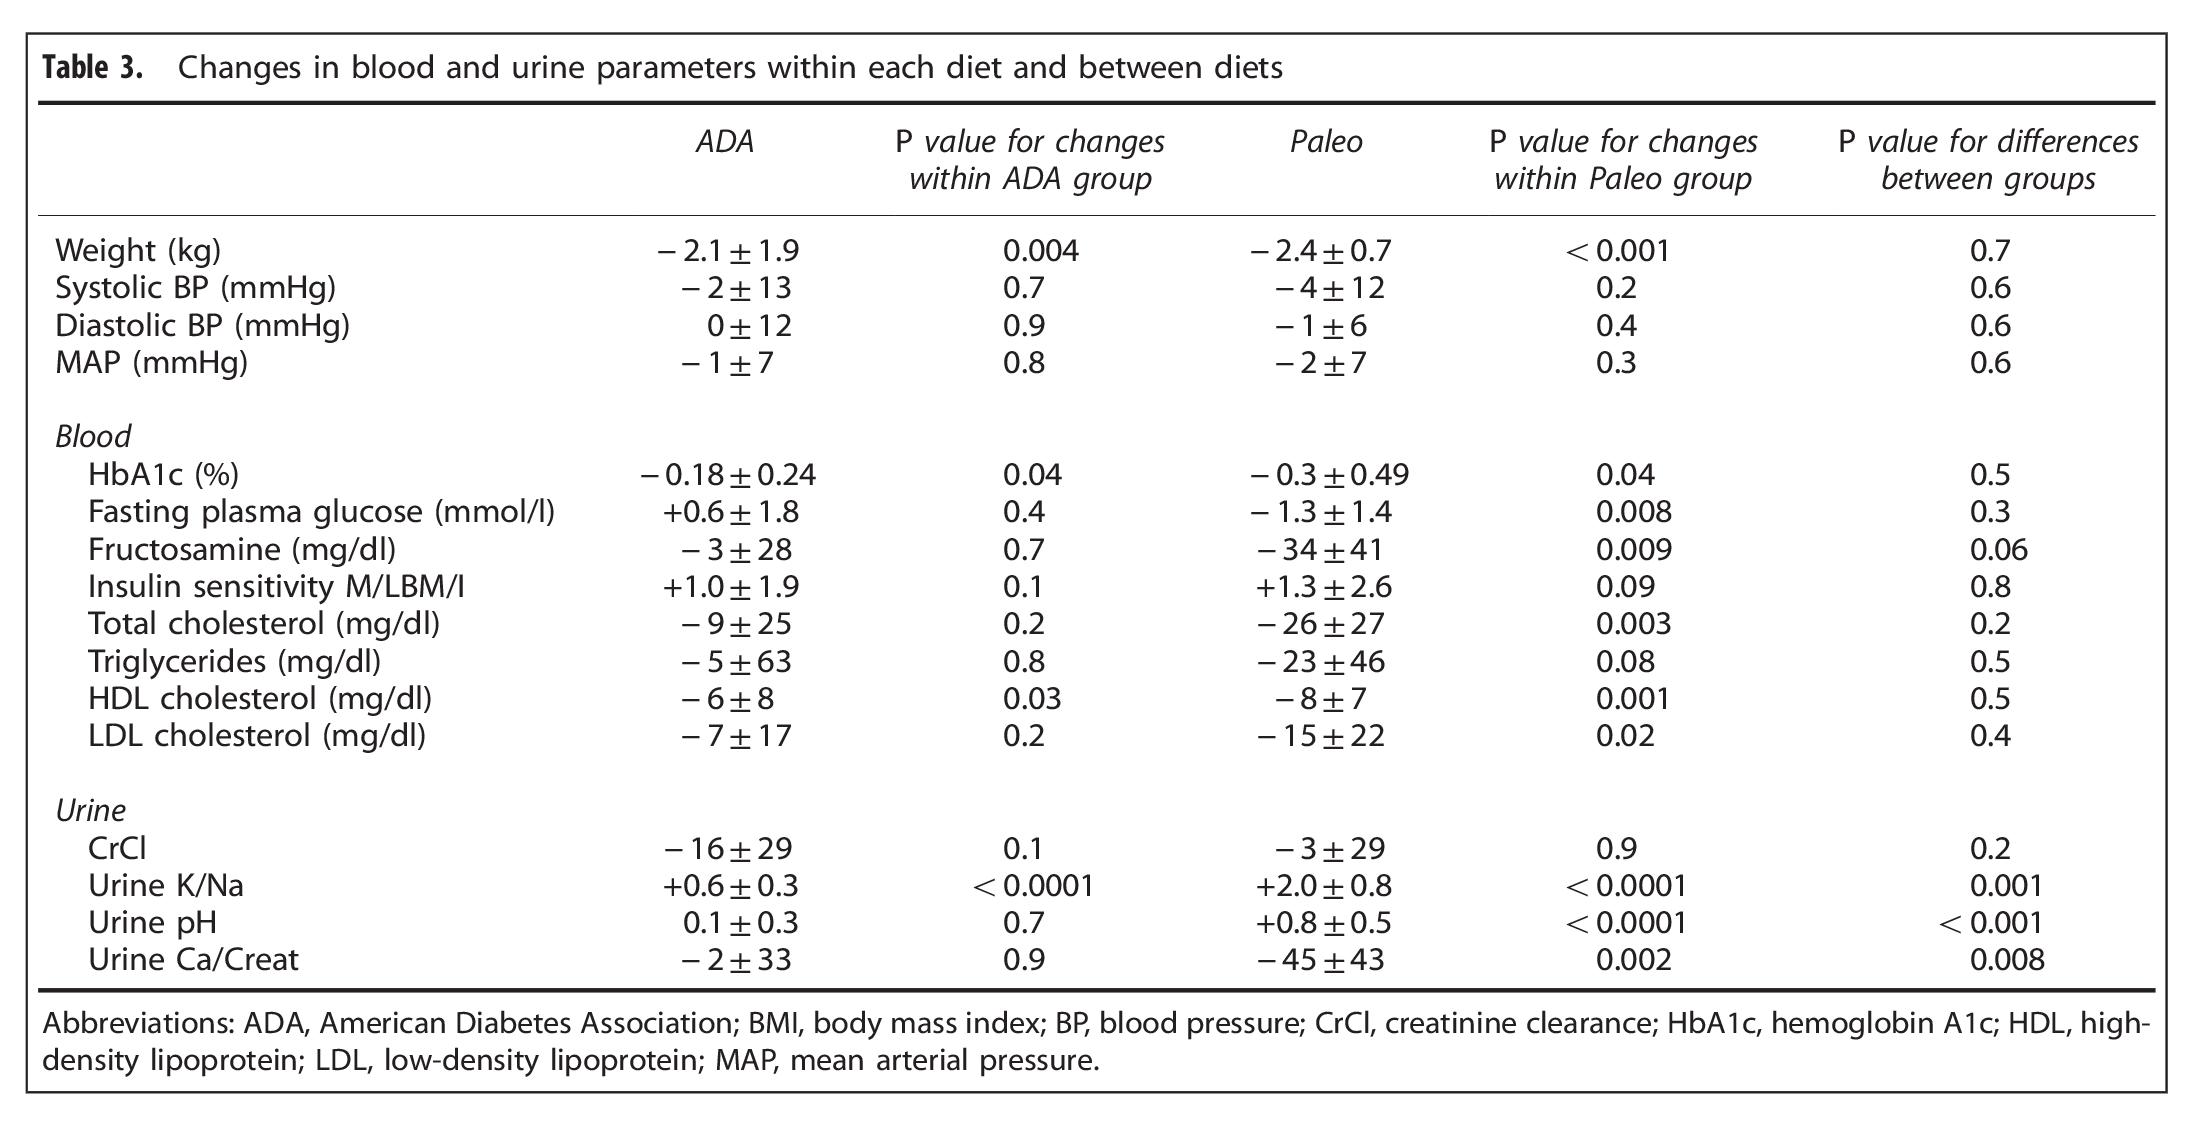 Changes in markers in Paleo vs ADA diet